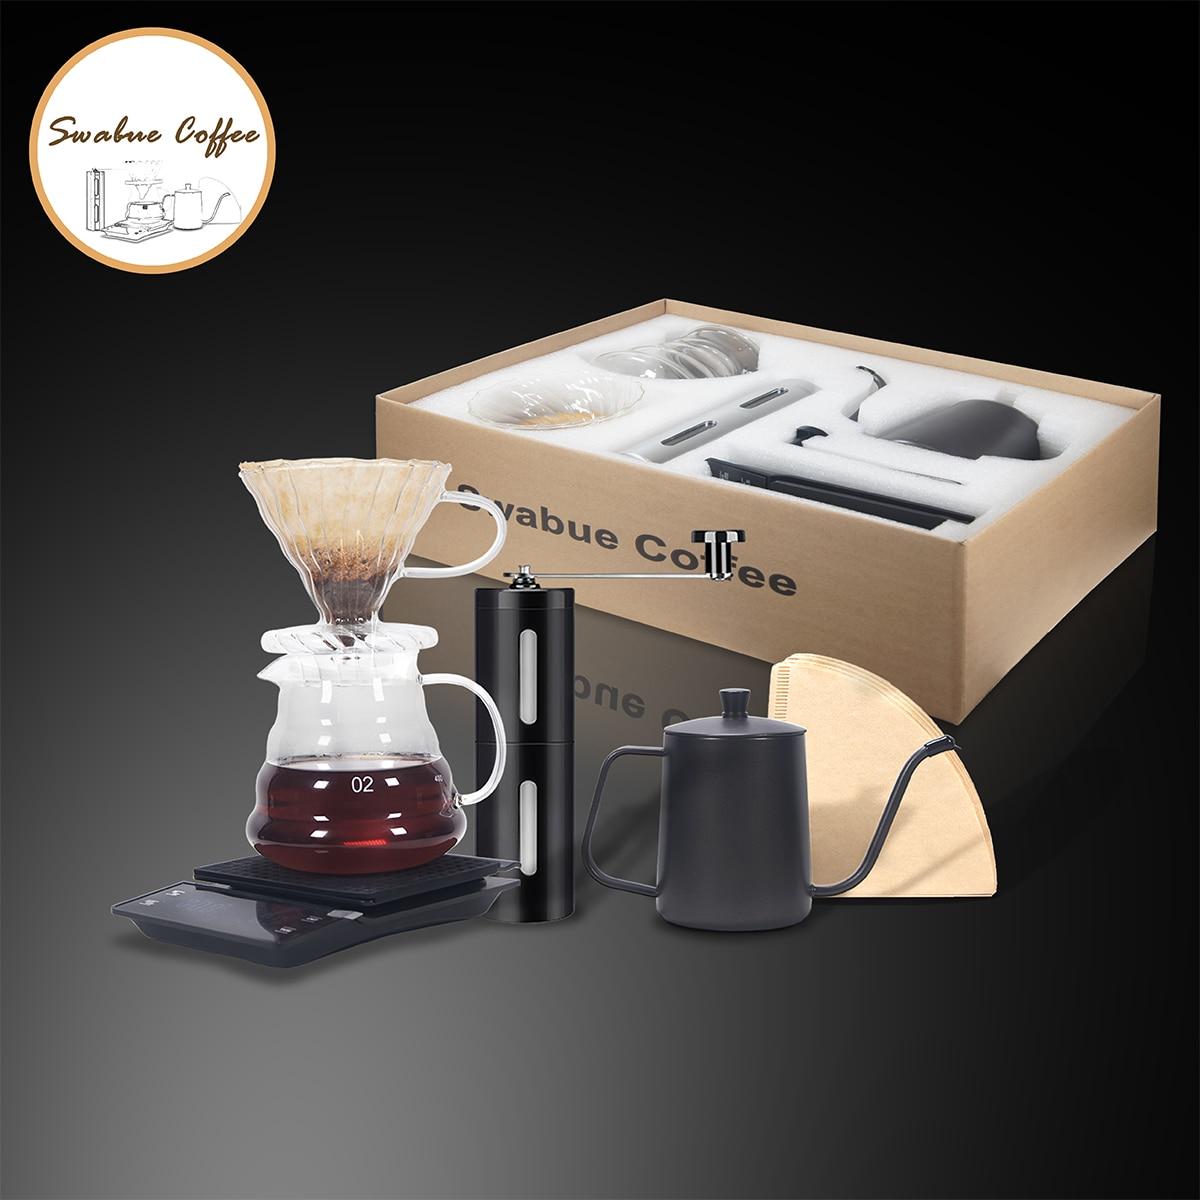 Swabue مجموعة ادوات القهوة V60 مرشح Papesr أواني الزجاج المنقط 500 مللي مقياس الخدمات طاحونة يدوية صانع المقهى 4/5 Sets